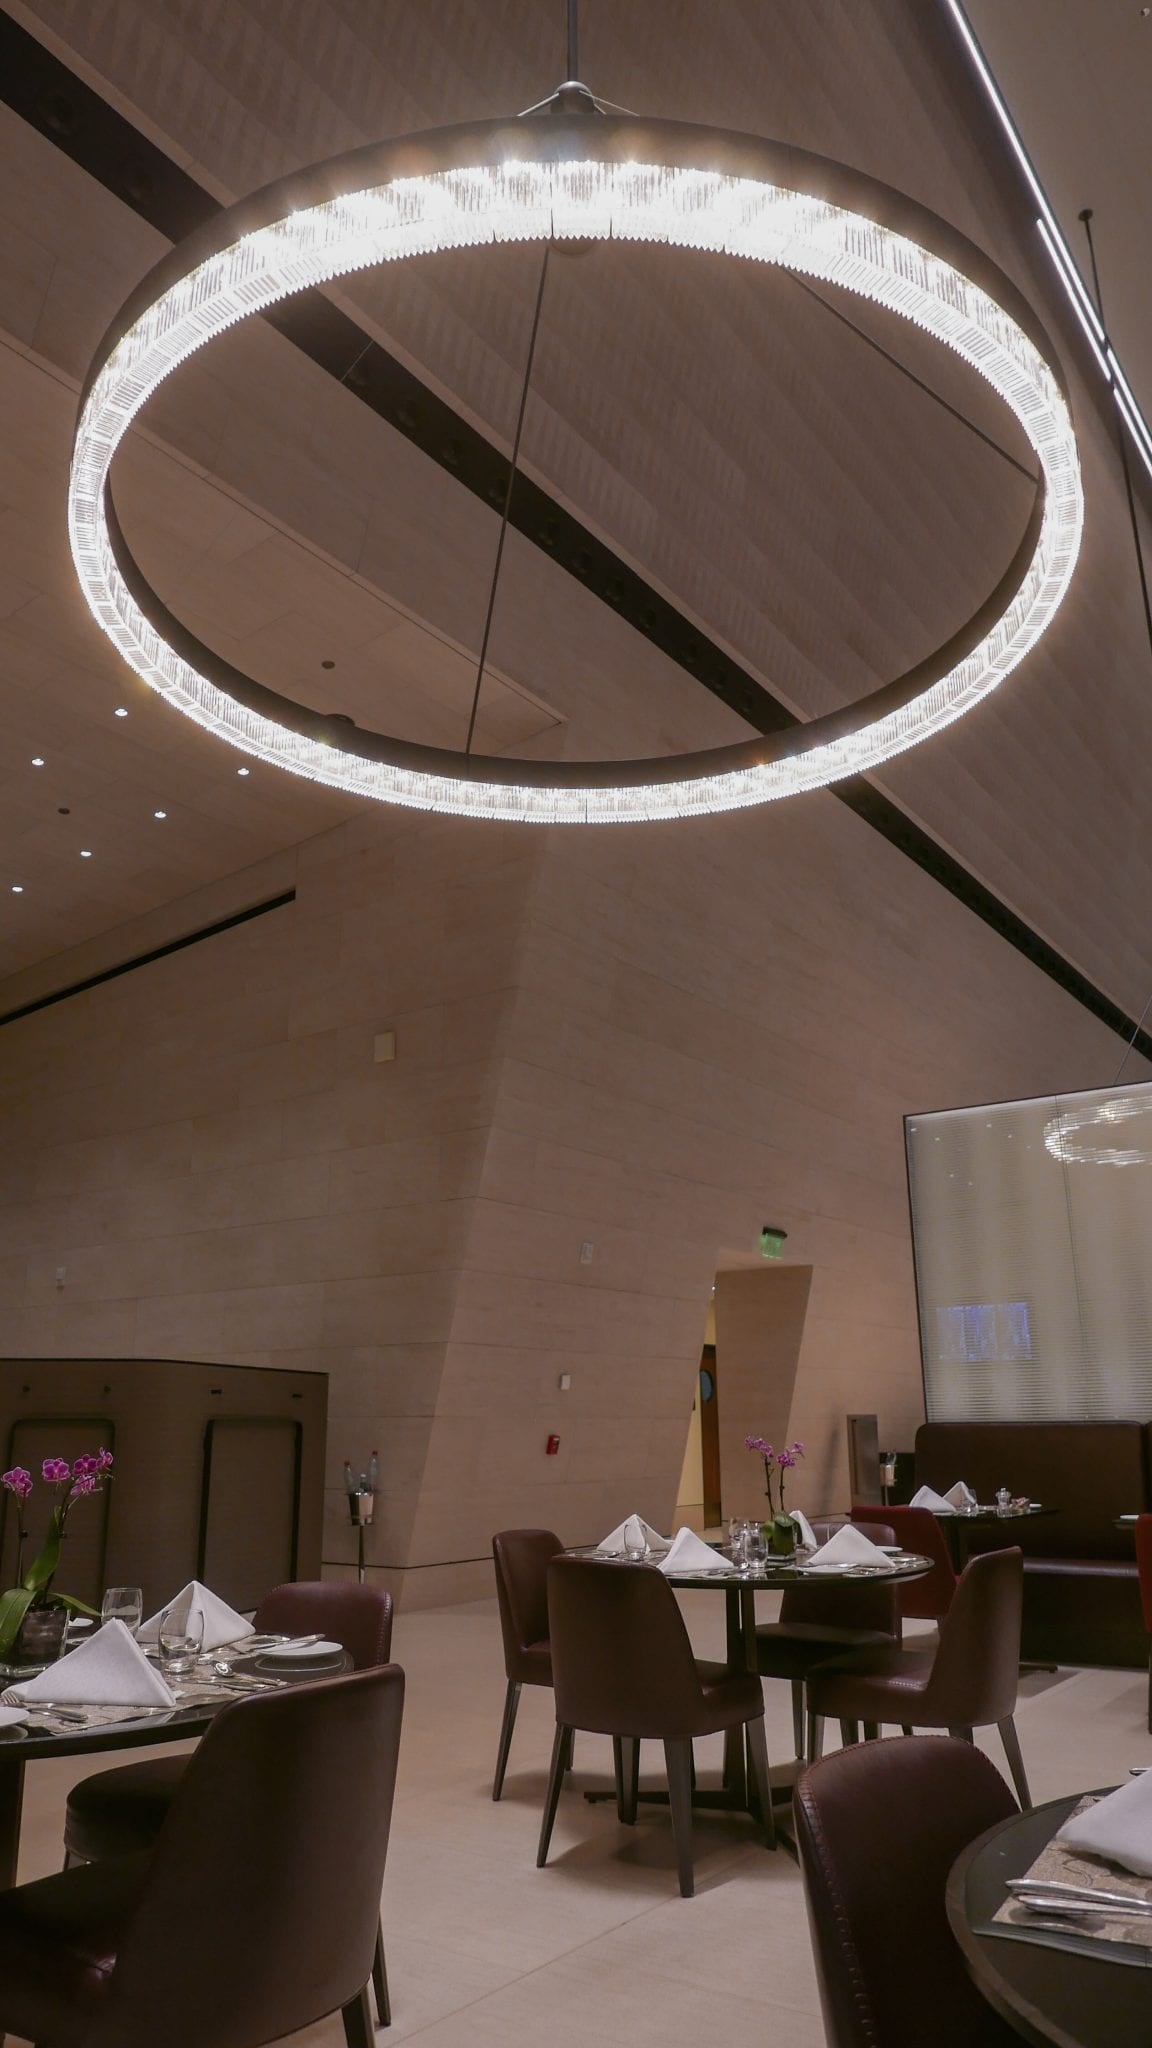 al safwa 6 - REVIEW - Qatar Al Safwa First Class Lounge - Doha